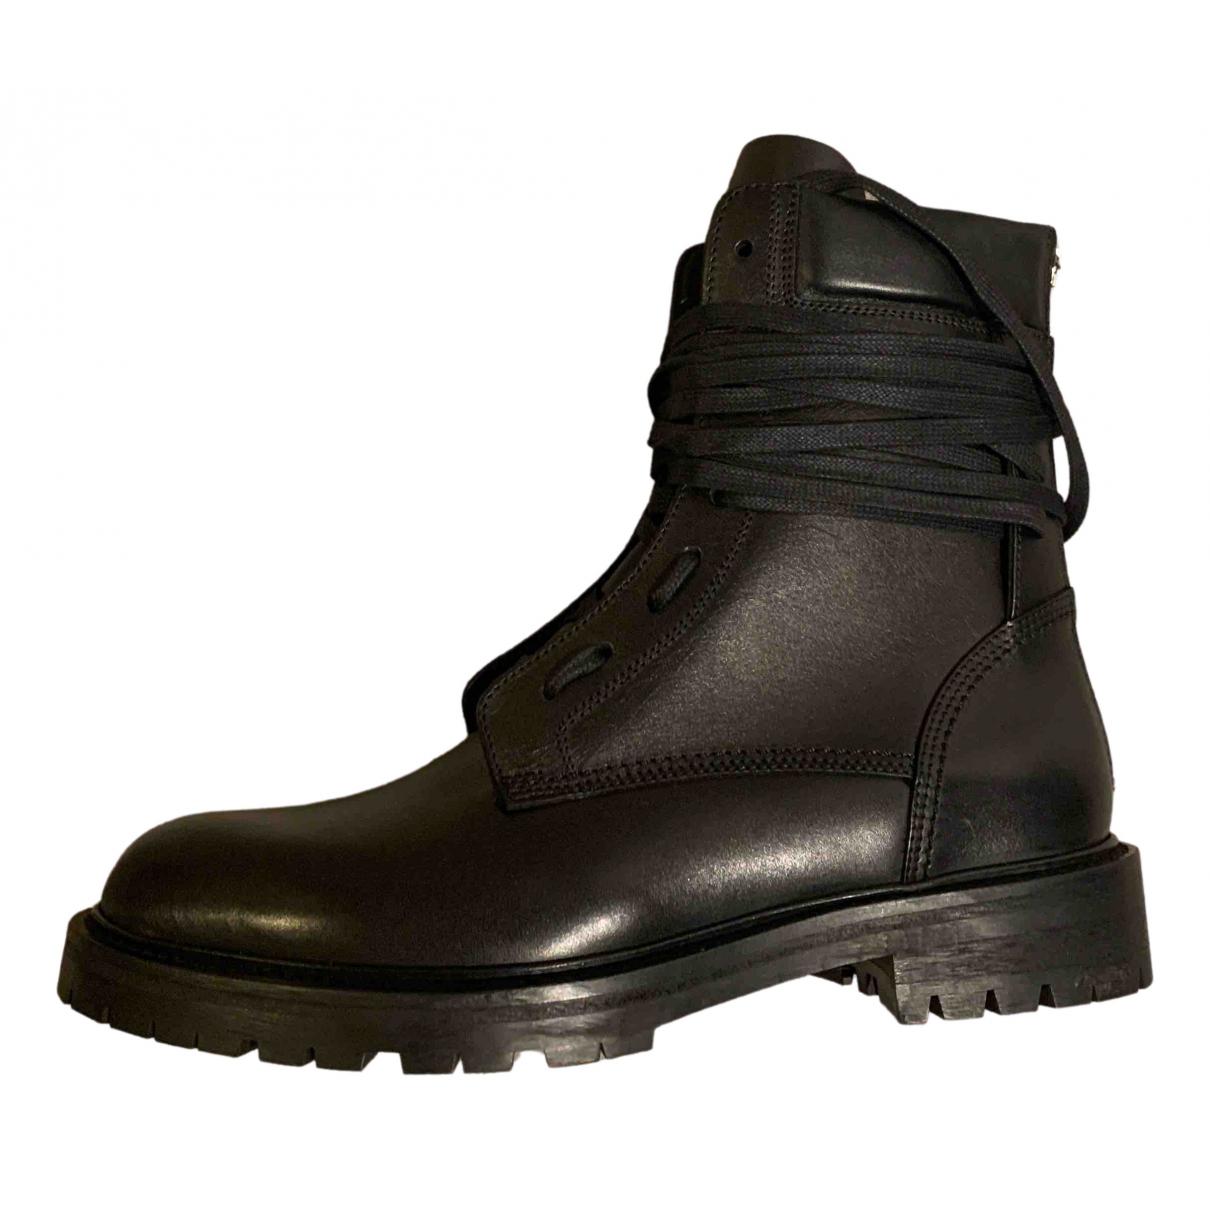 Amiri N Black Leather Boots for Men 41.5 EU